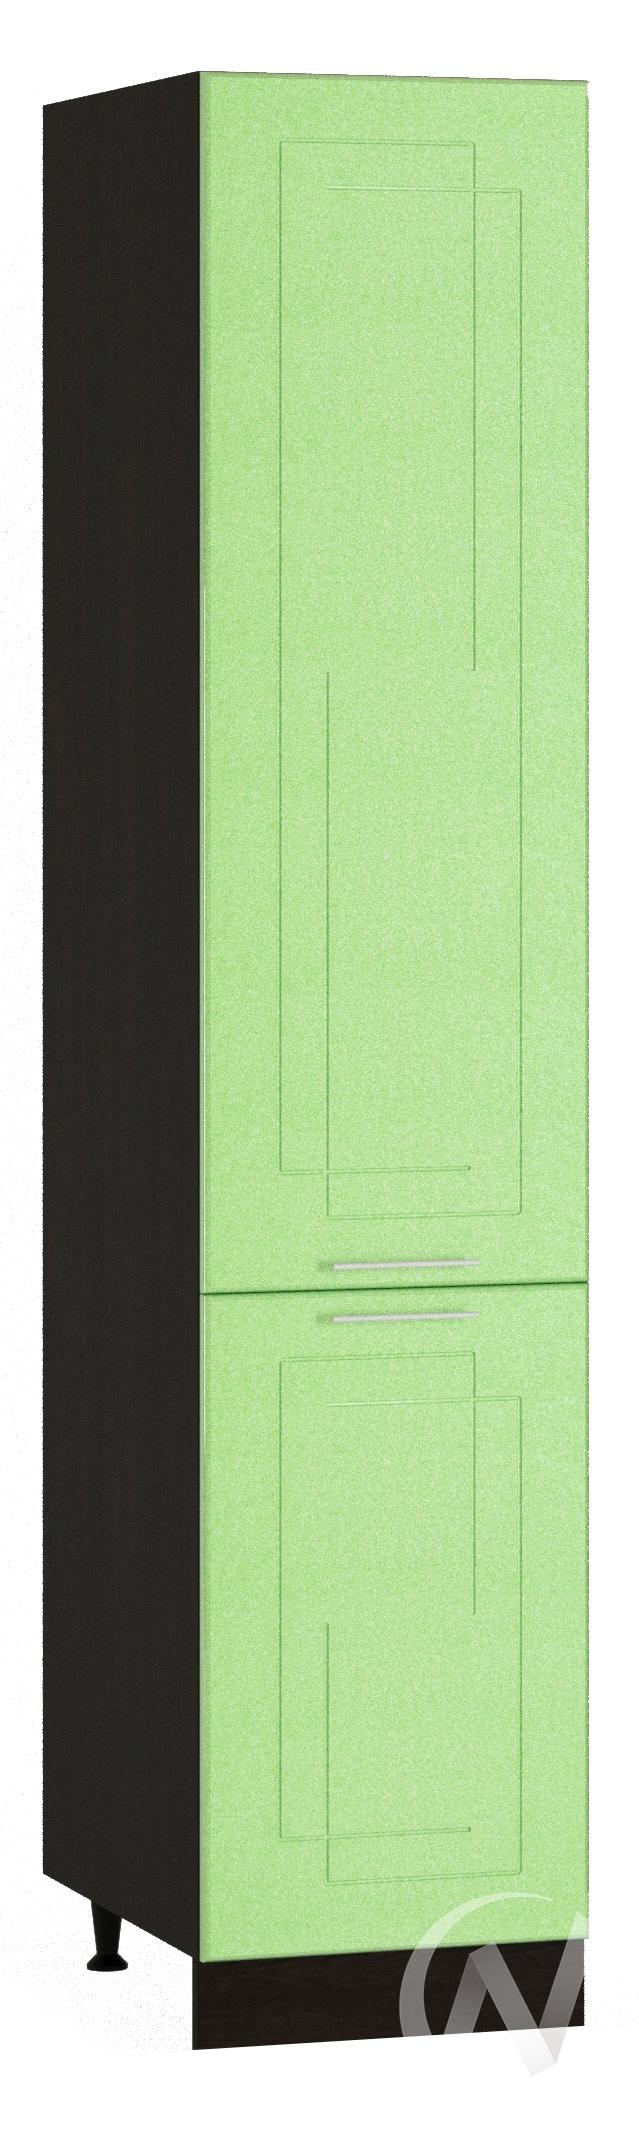 "Кухня ""Вега"": Шкаф пенал 400, ШП 400 (салатовый металлик/корпус венге)"